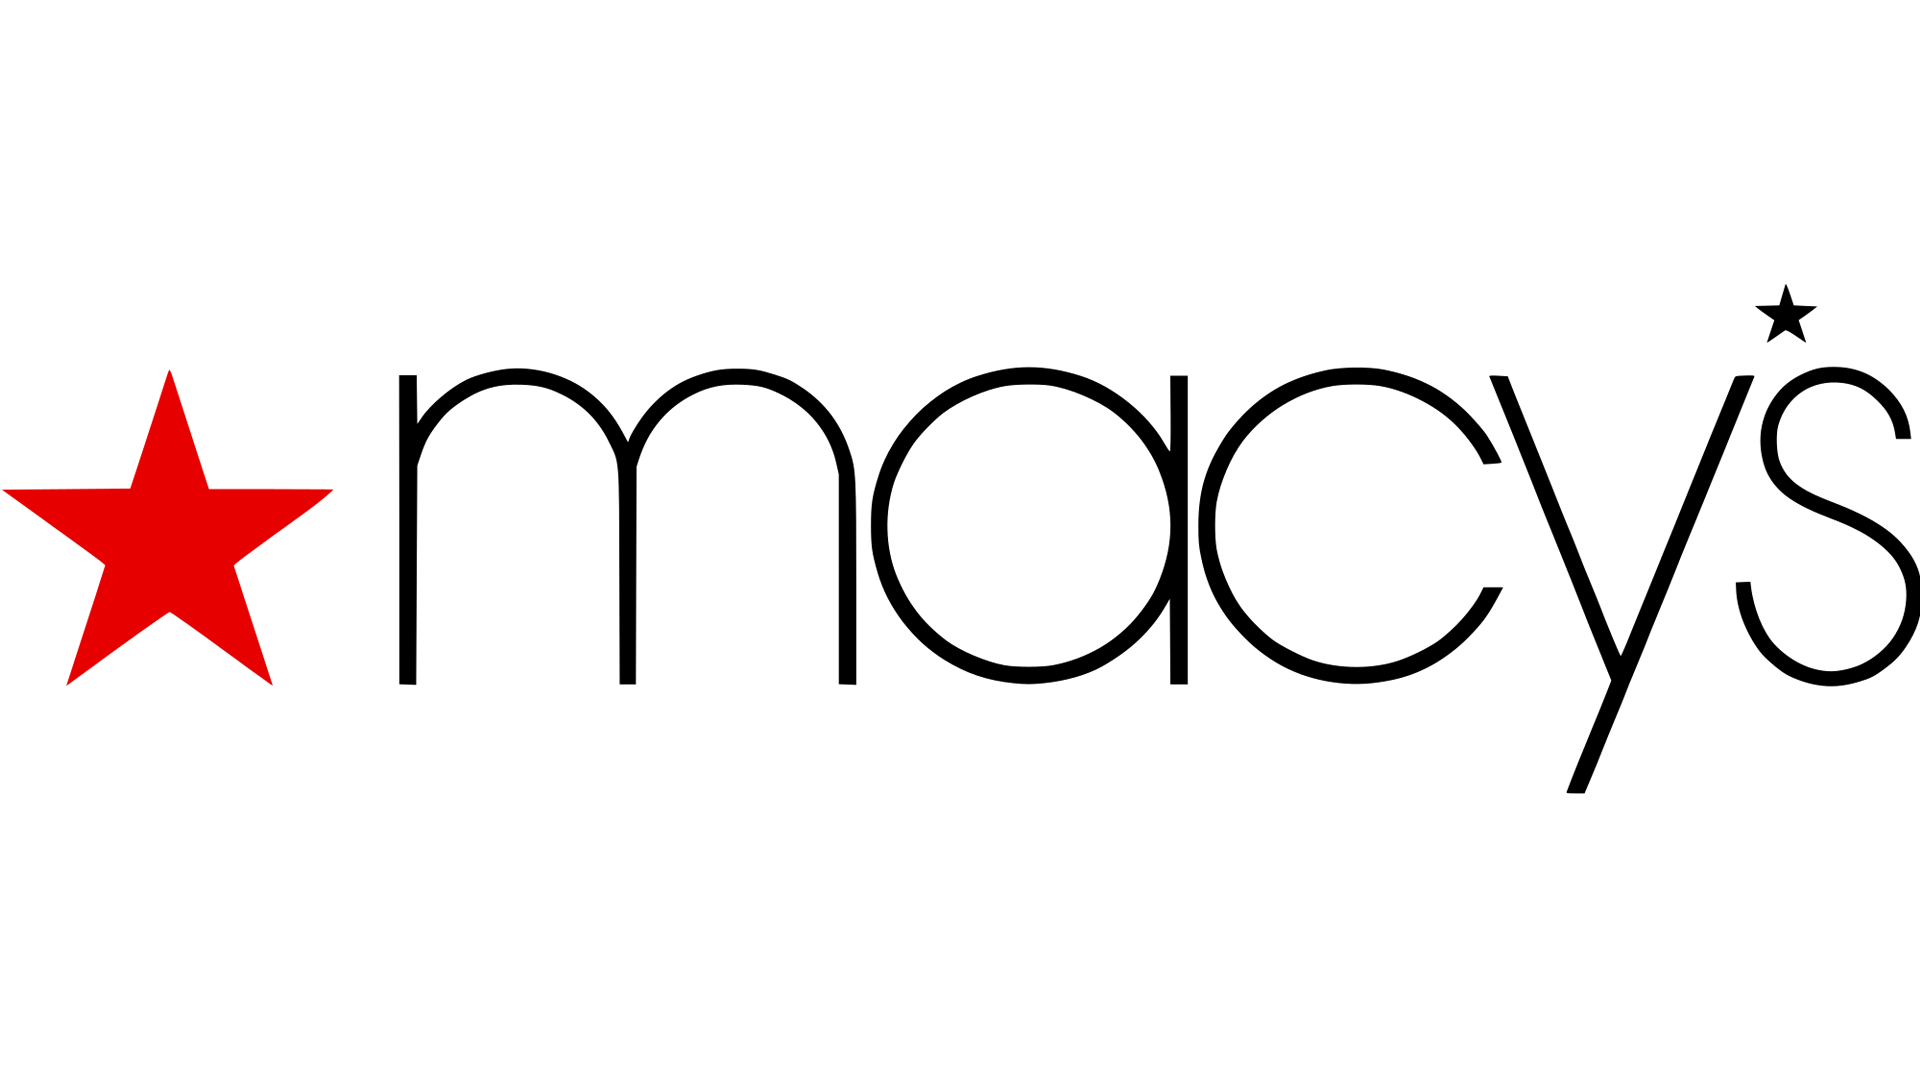 macys logo  macys symbol  meaning  history and evolution